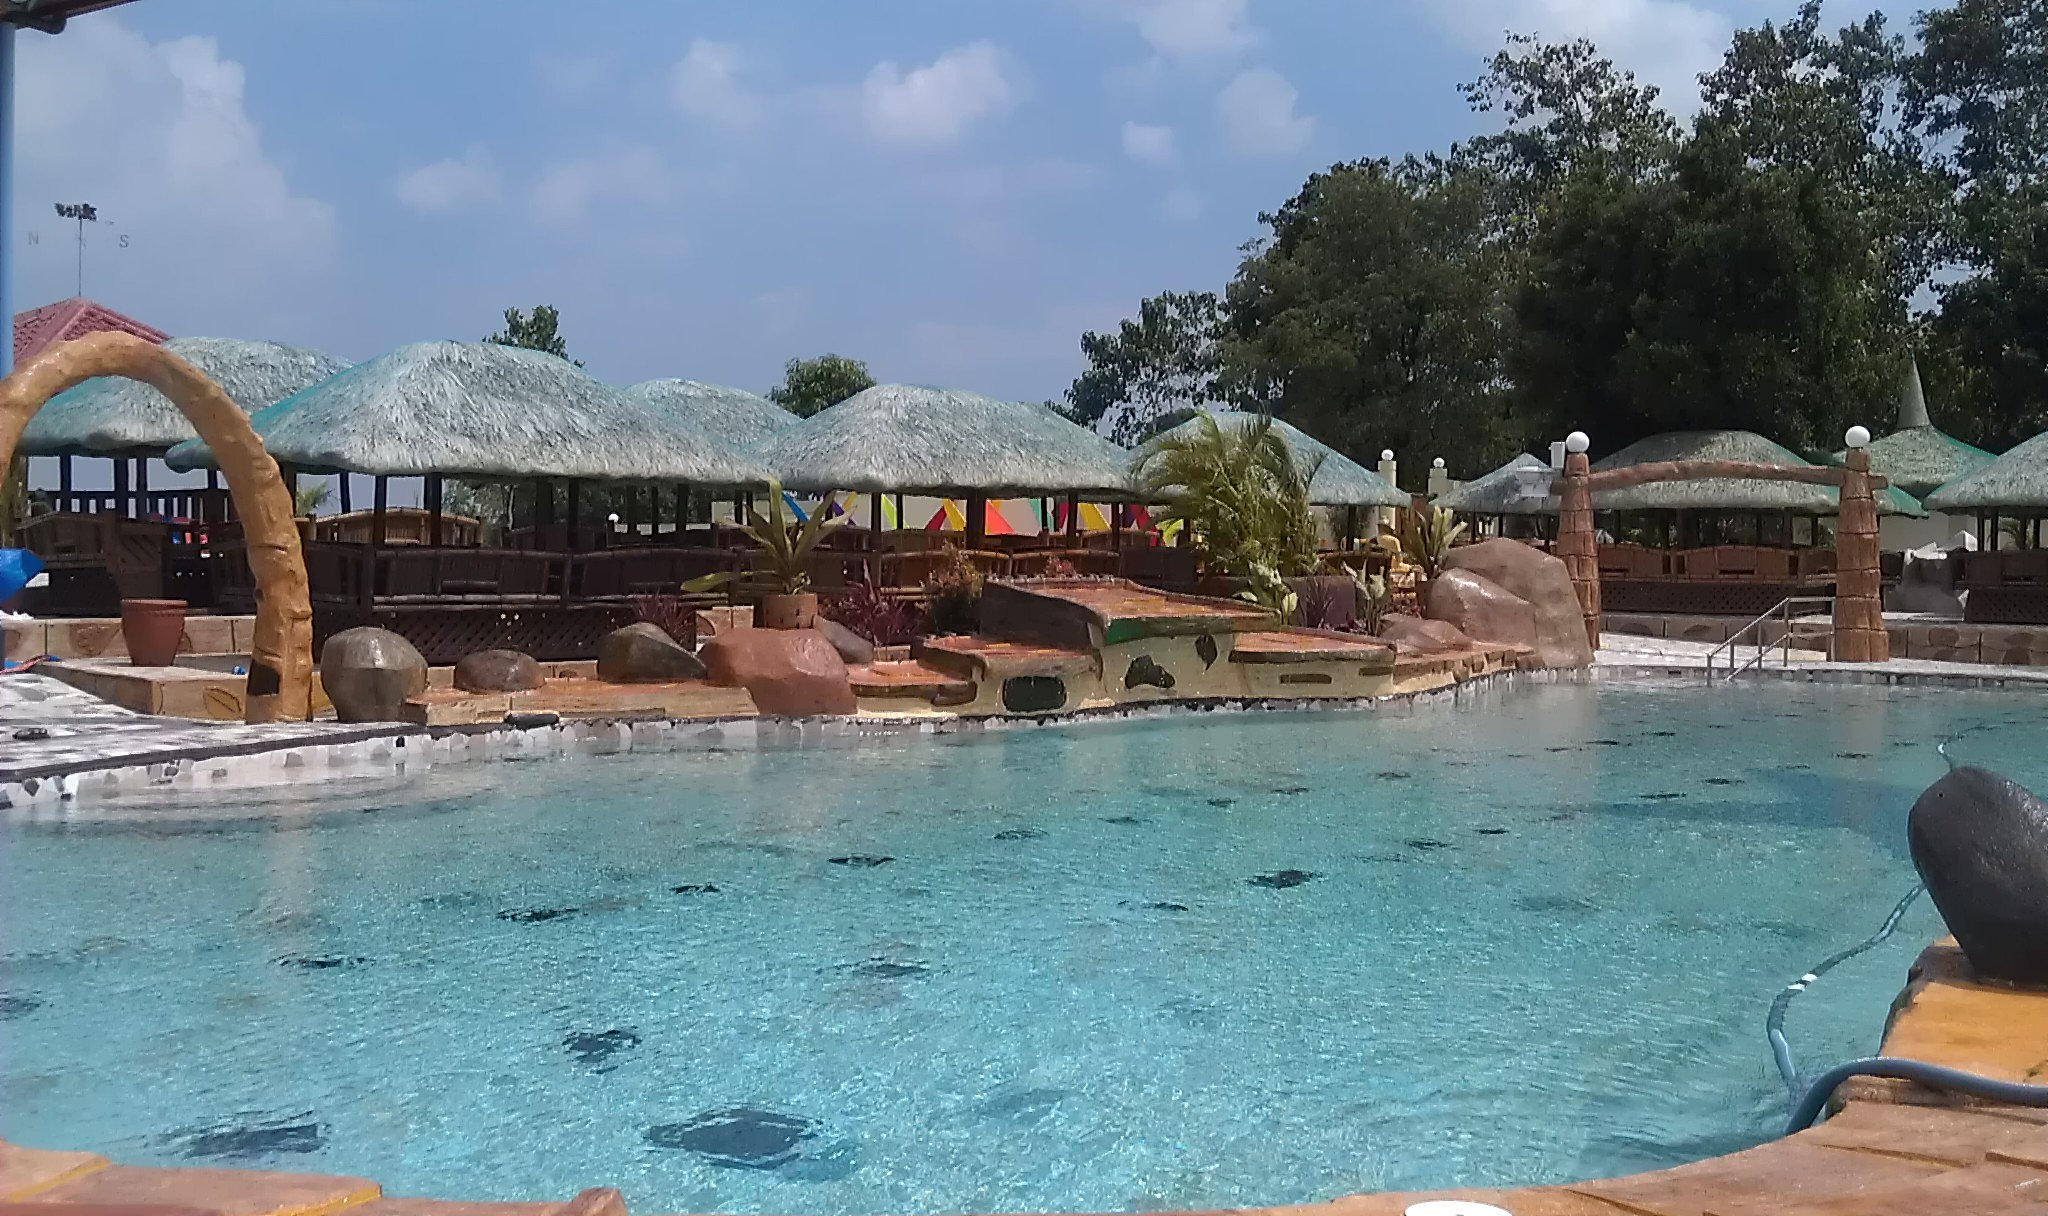 Antipolo star resort - Public salt water swimming pools melbourne ...